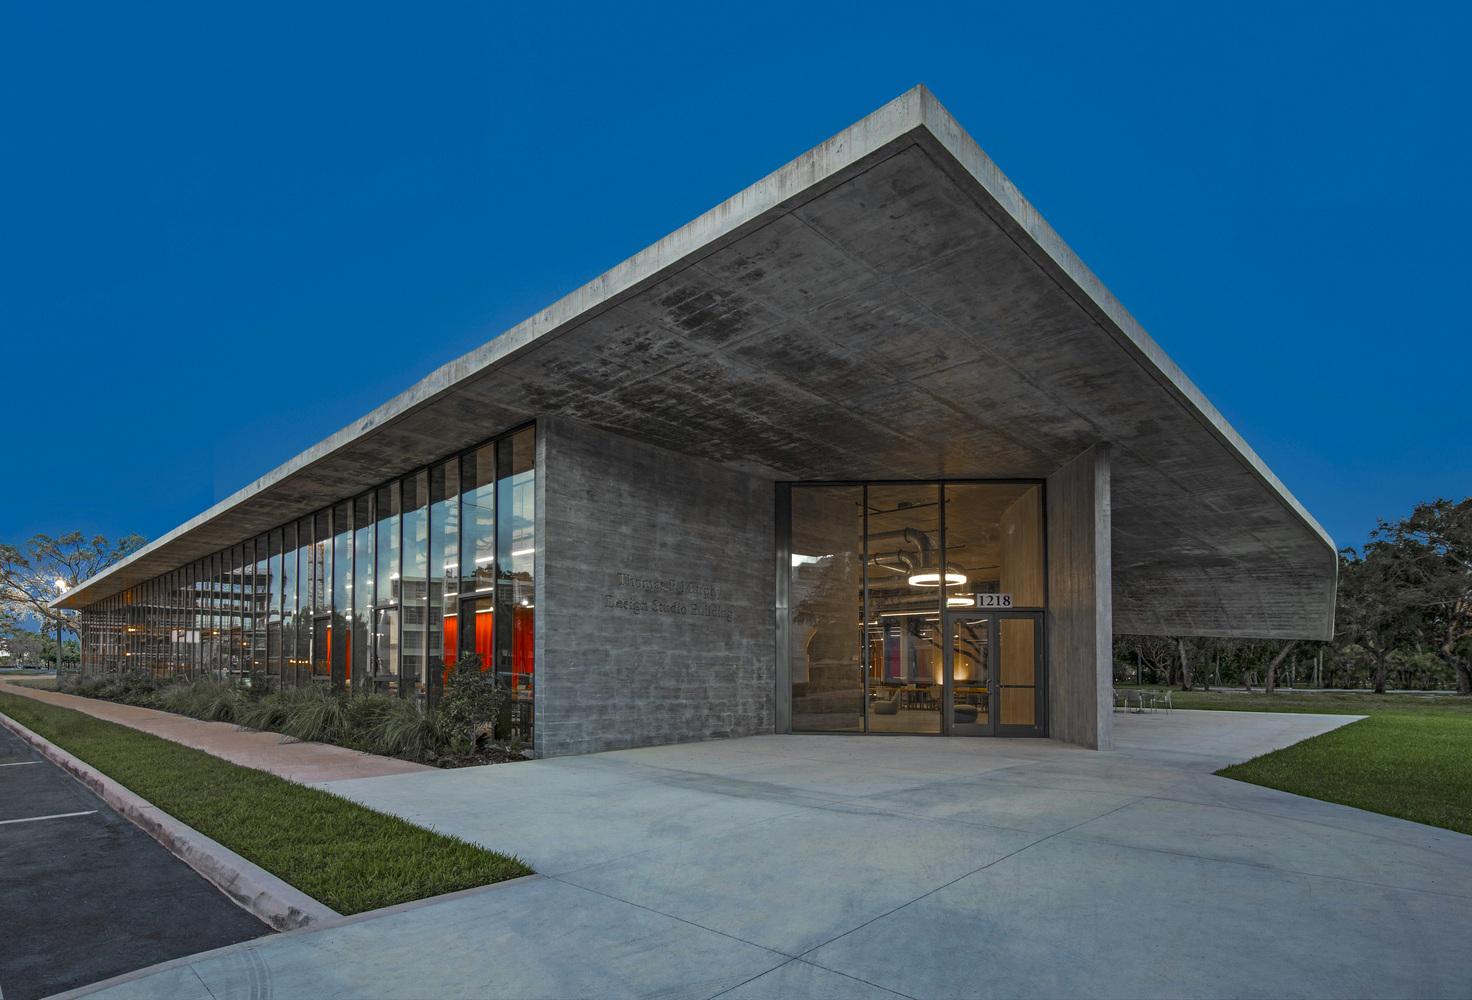 13_University of Miami School of Architecture_Arquitectonica_Inspirationist